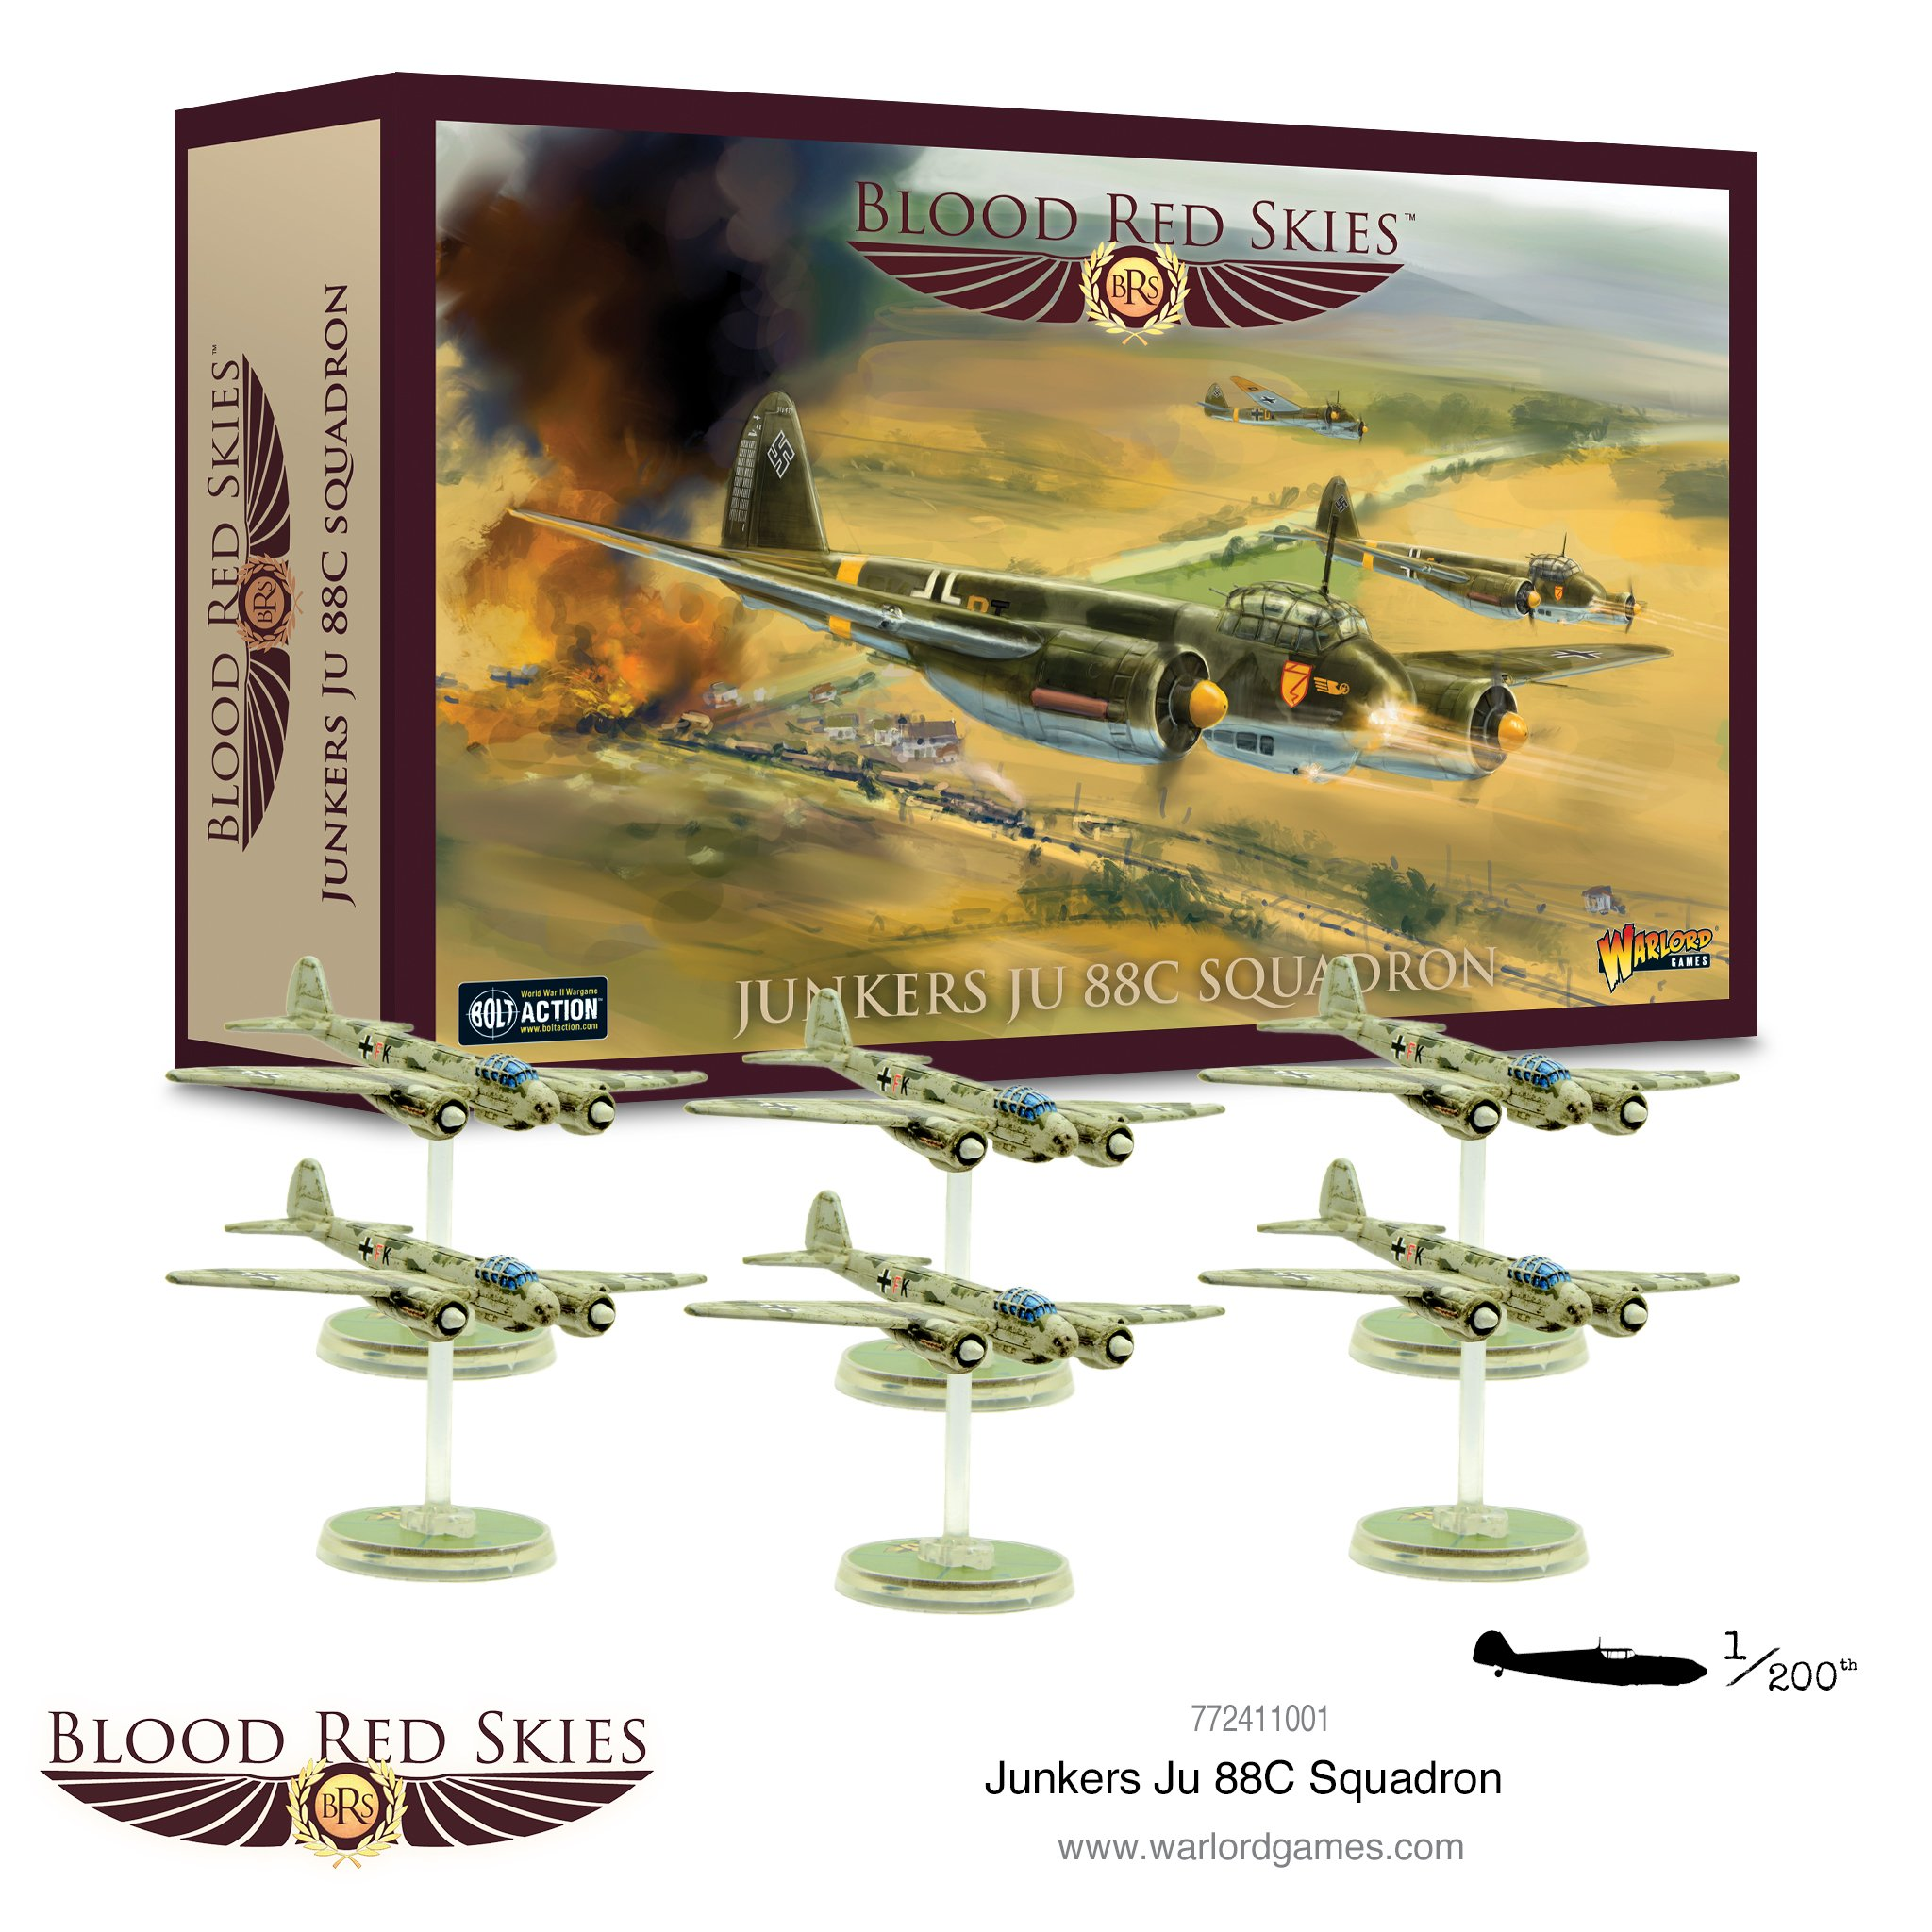 Blood Red Skies Junkers Ju 88C Squadron